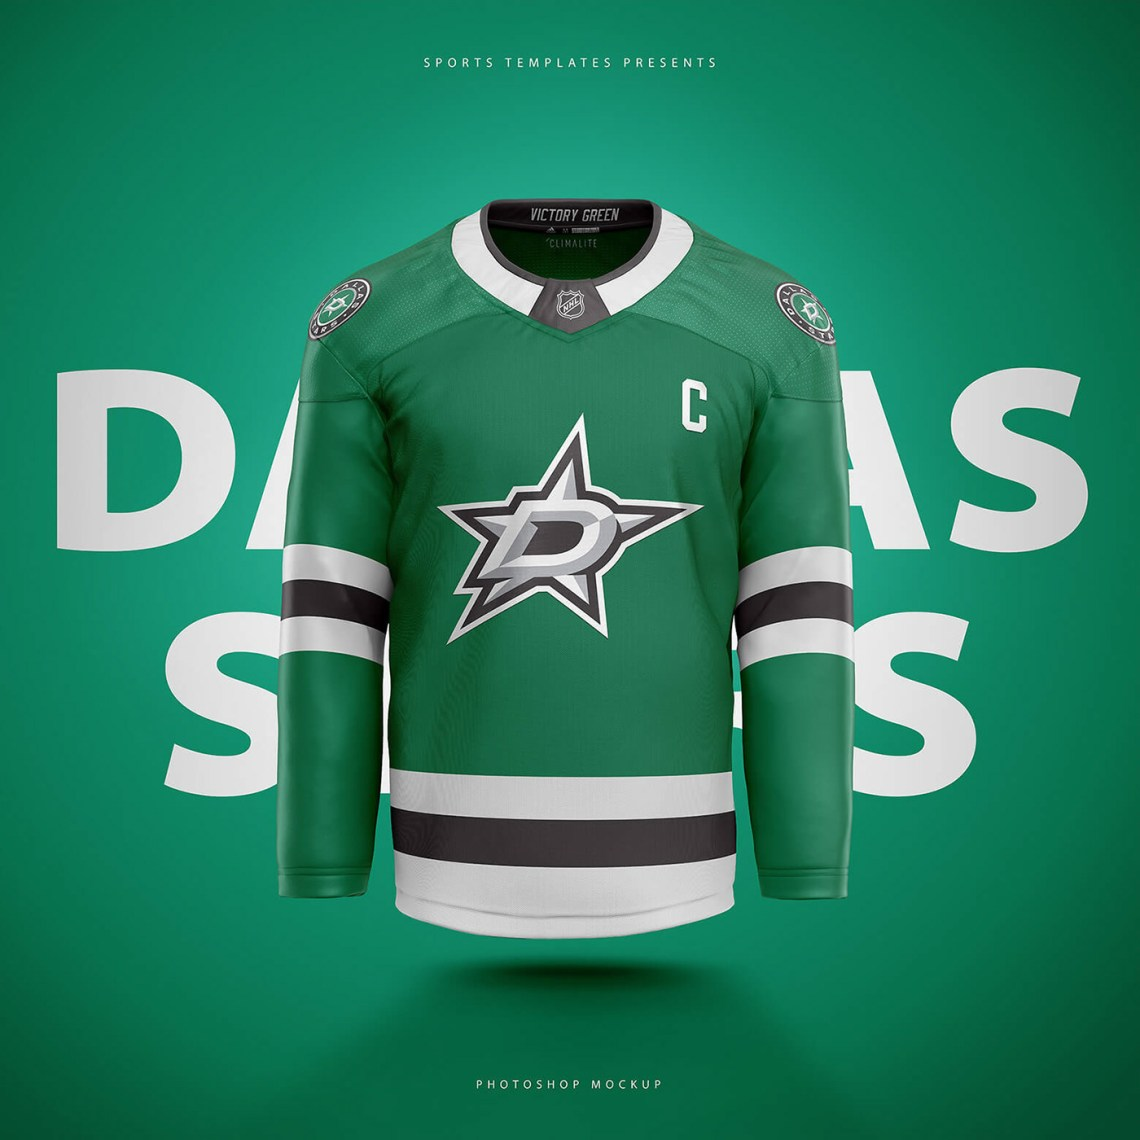 Download Adidas Adizero Hockey Jersey Photoshop Template 2.0 on Behance